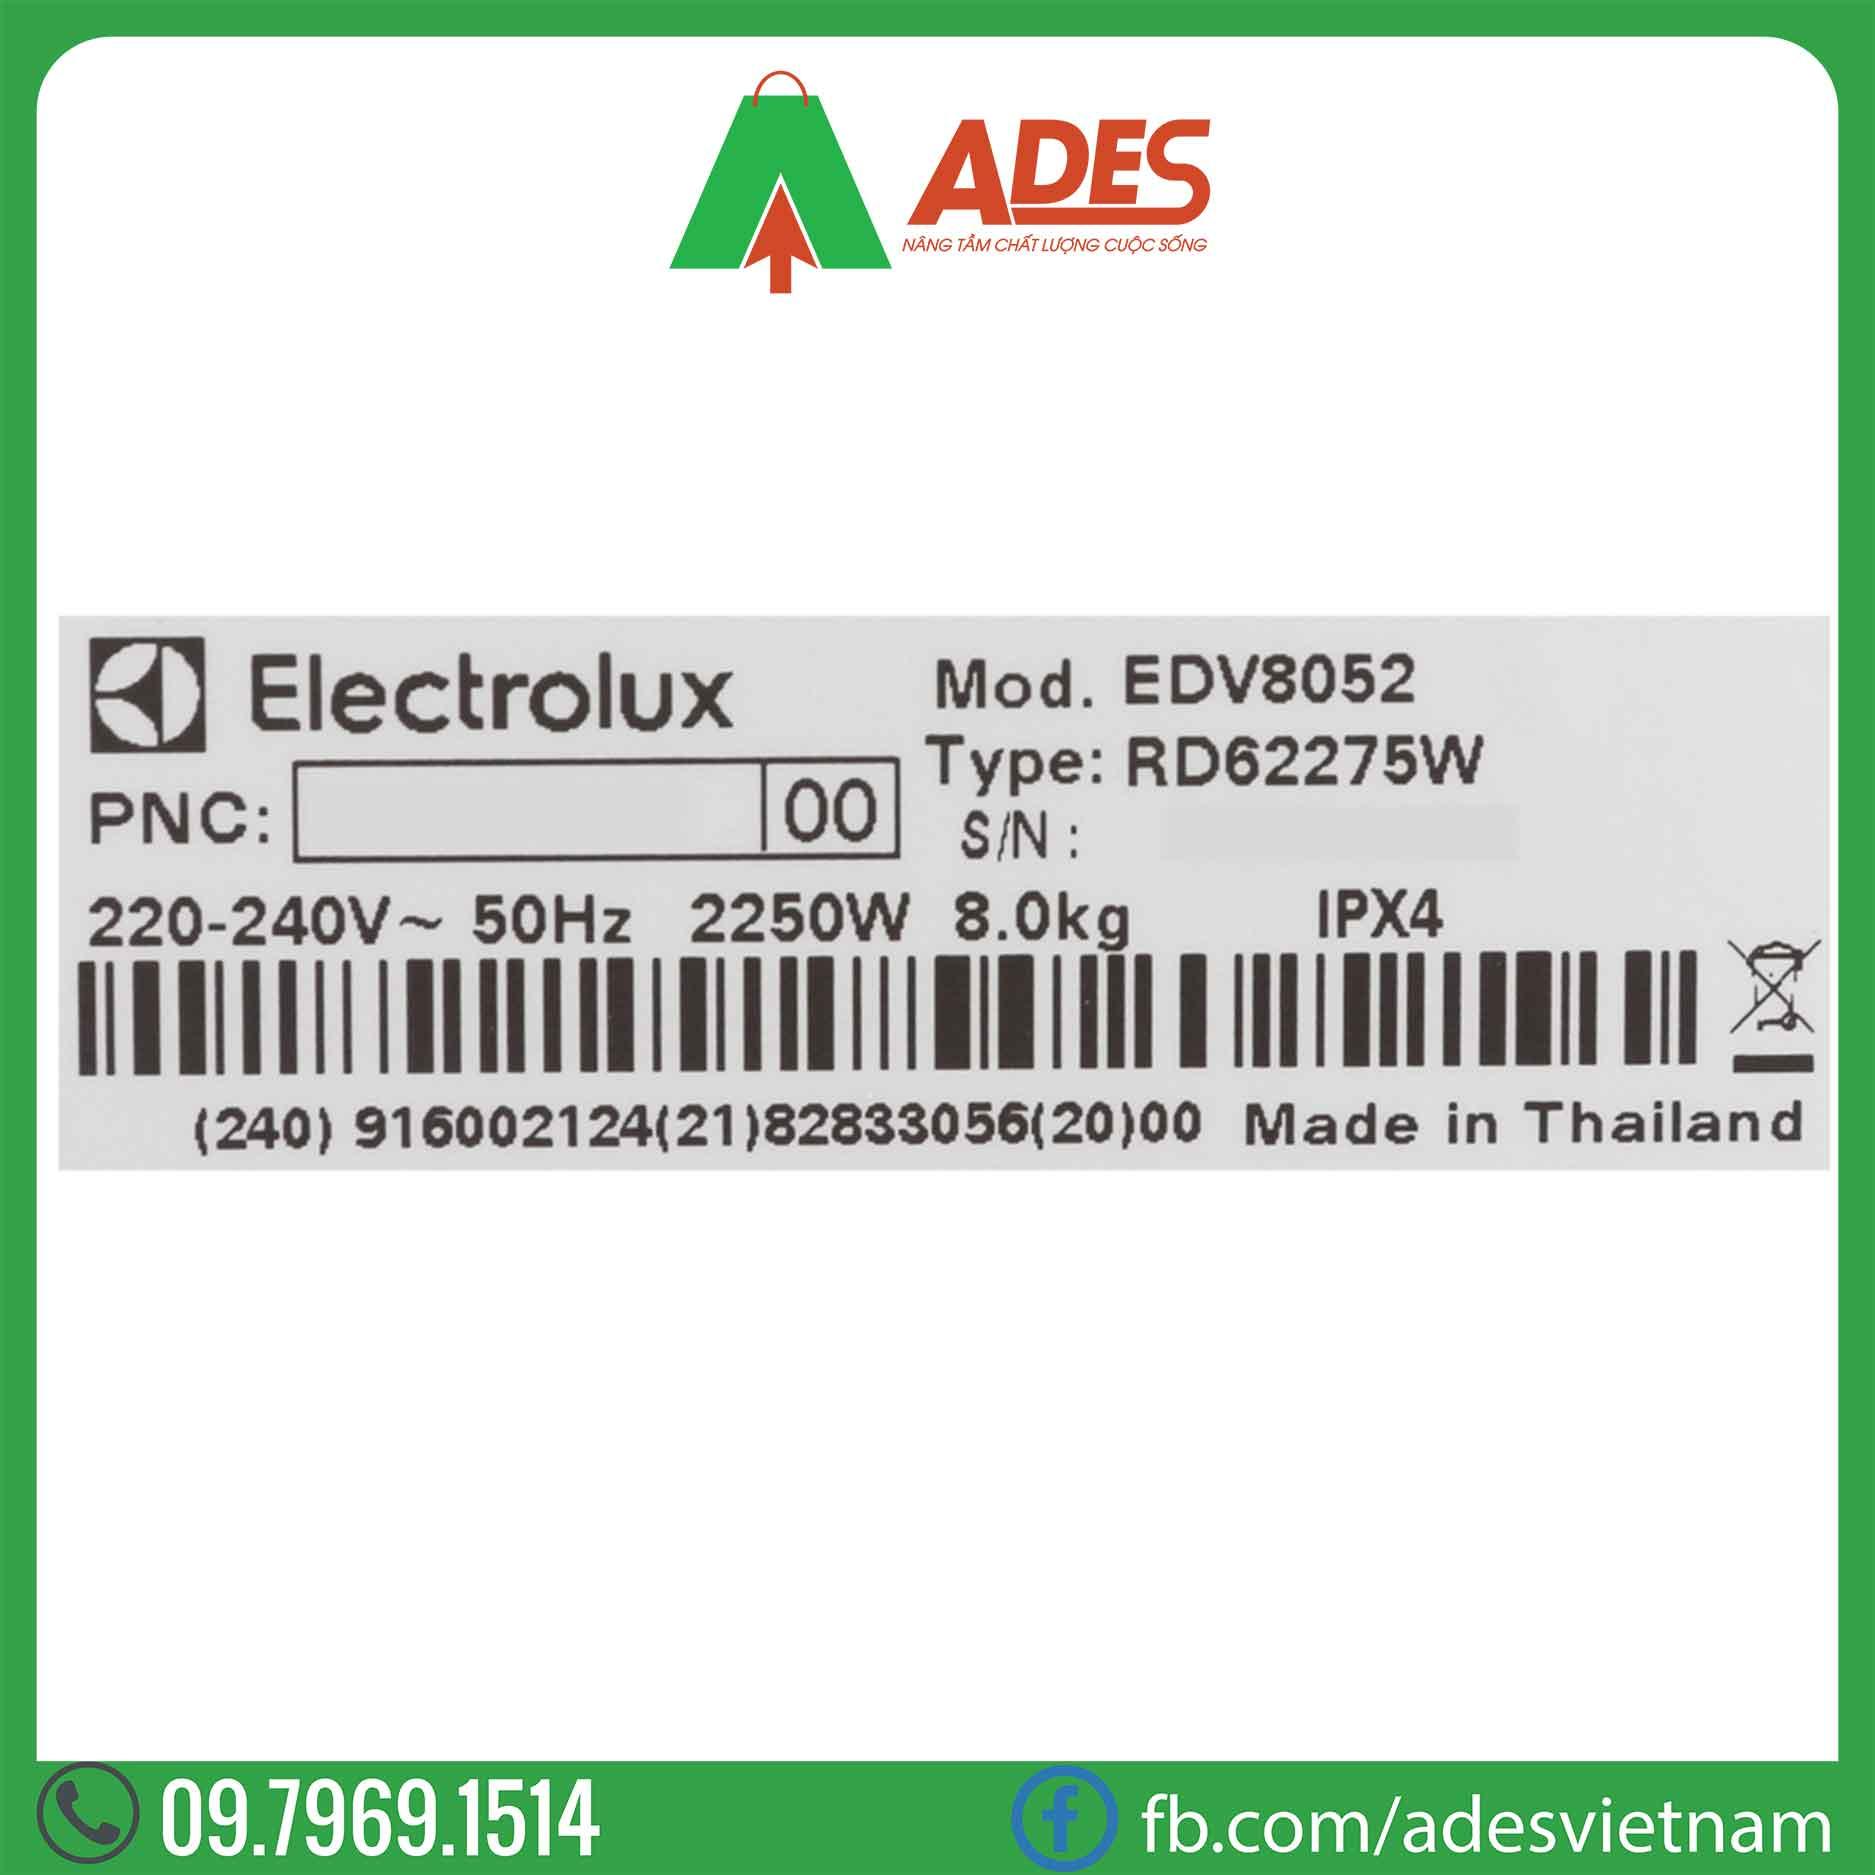 May say Electrolux 8 Kg EDV8052